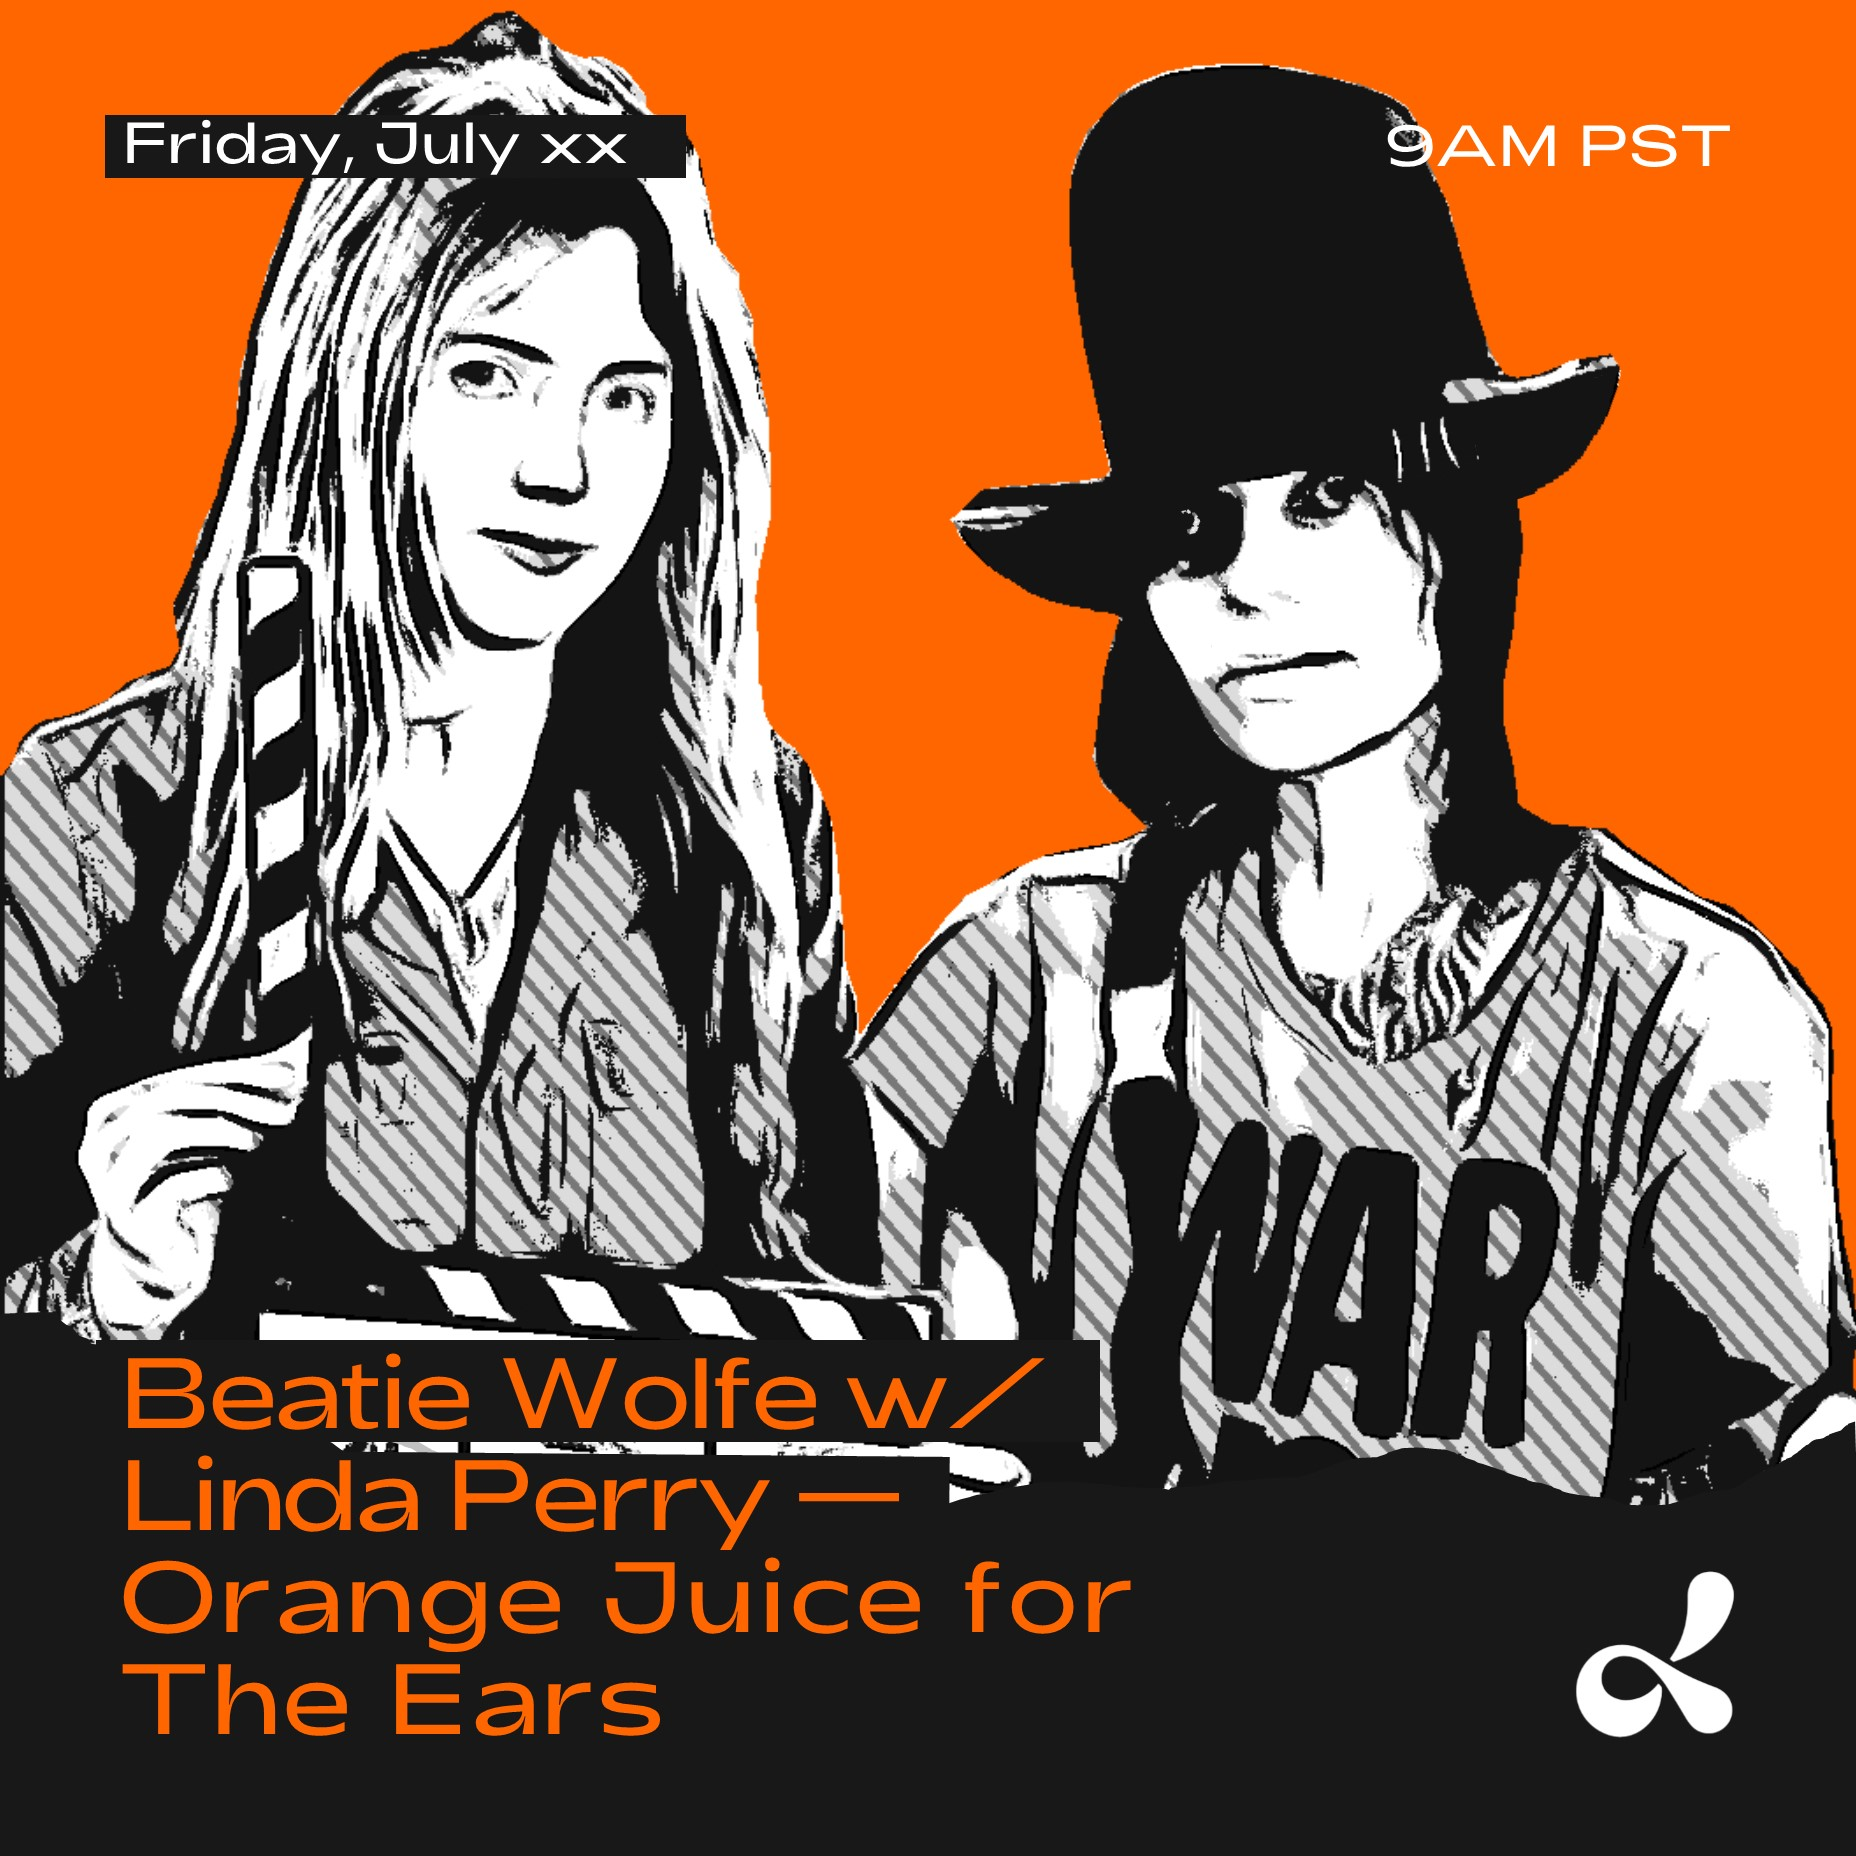 ep.xx Linda Perry on OJ for the Ears 3 - Dublab radio x Beatie Wolfe.jpg